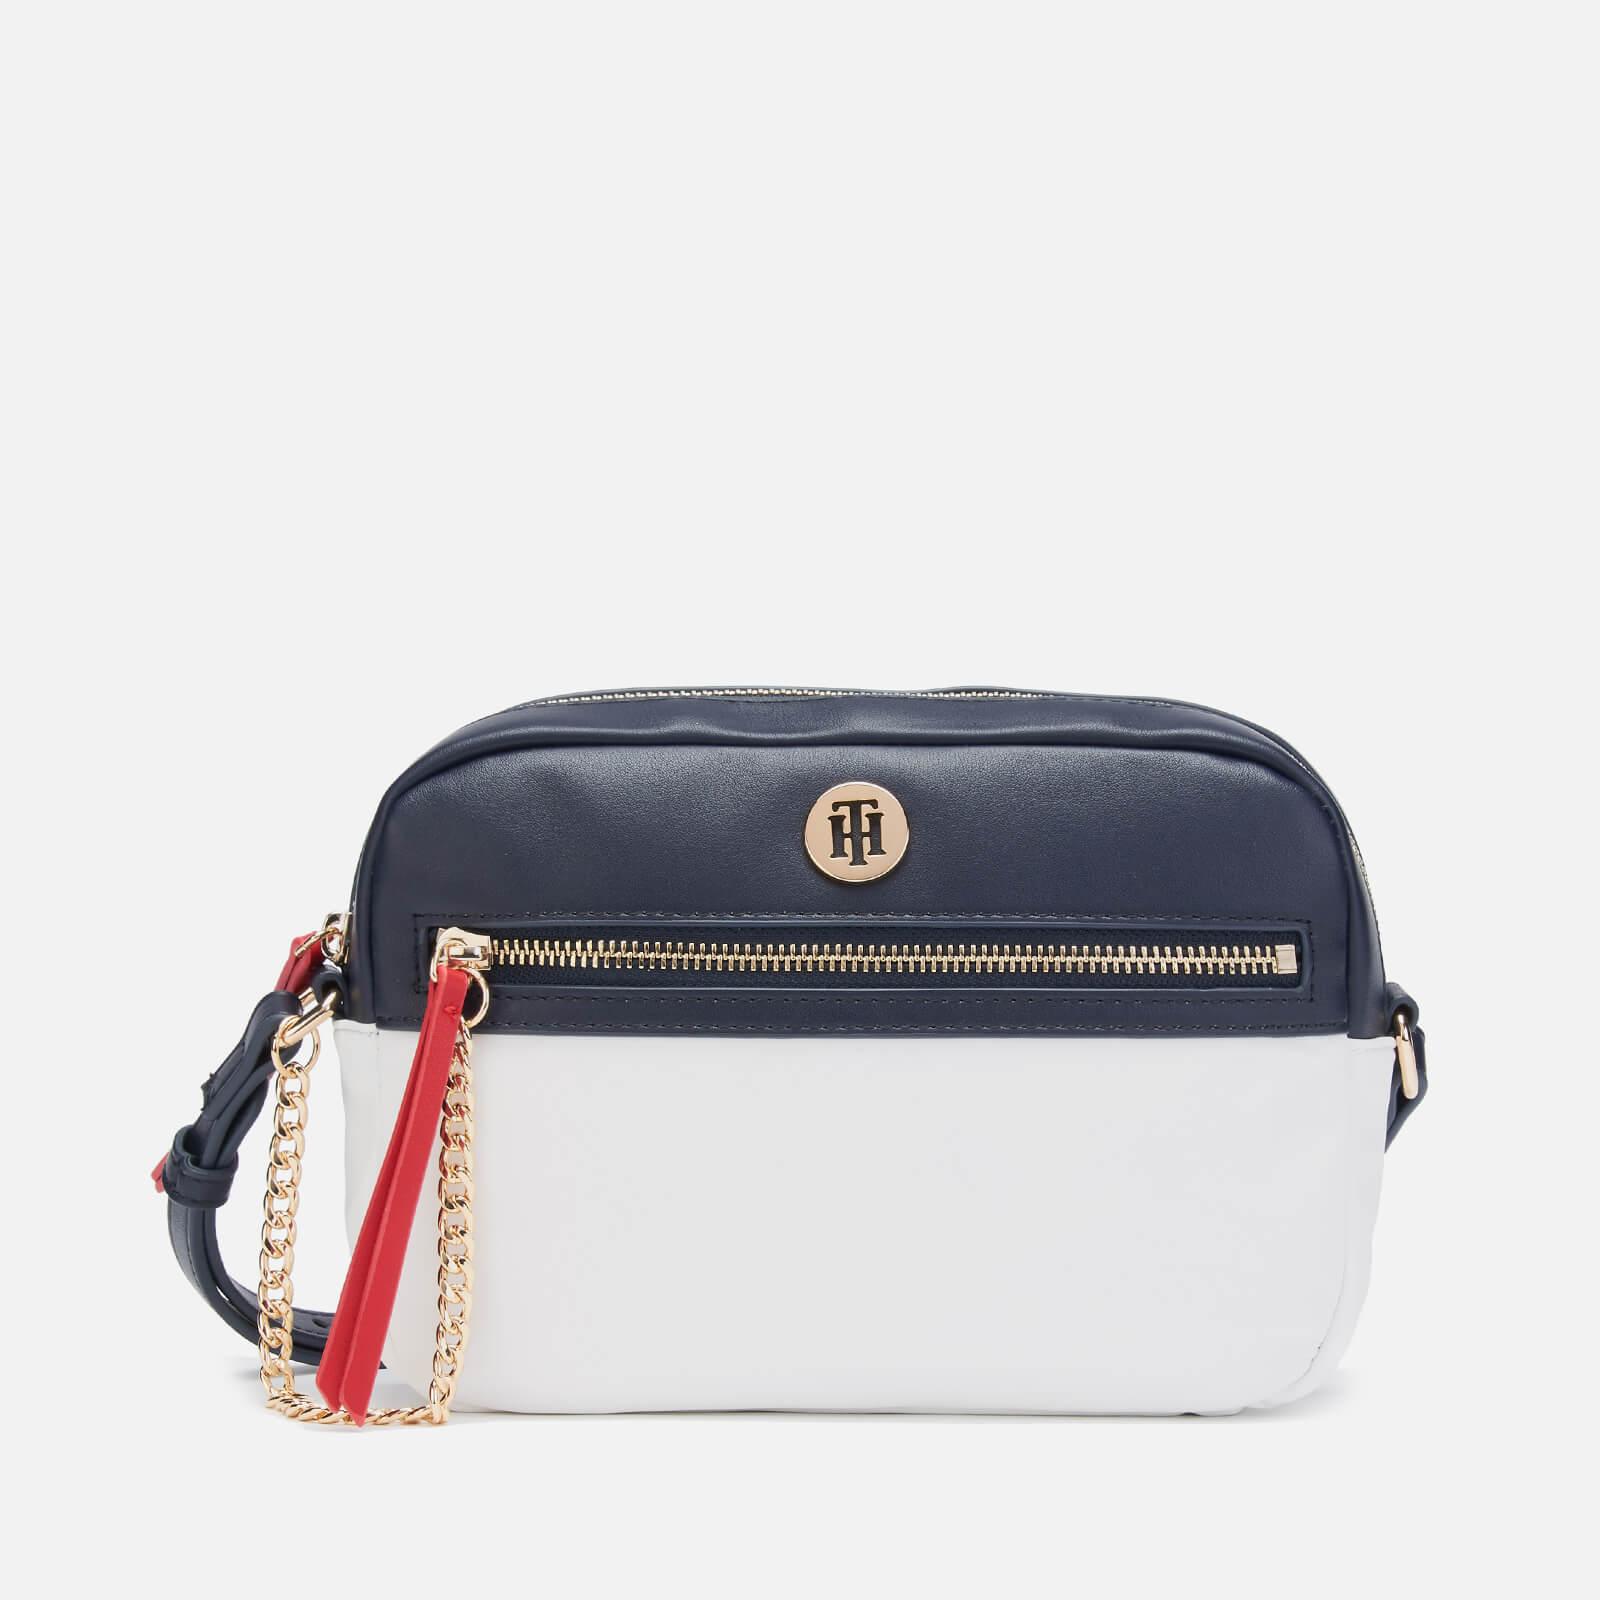 7ac6704037 Tommy Hilfiger Women's Core Nylon Crossover Bag - Corporate Womens  Accessories   TheHut.com